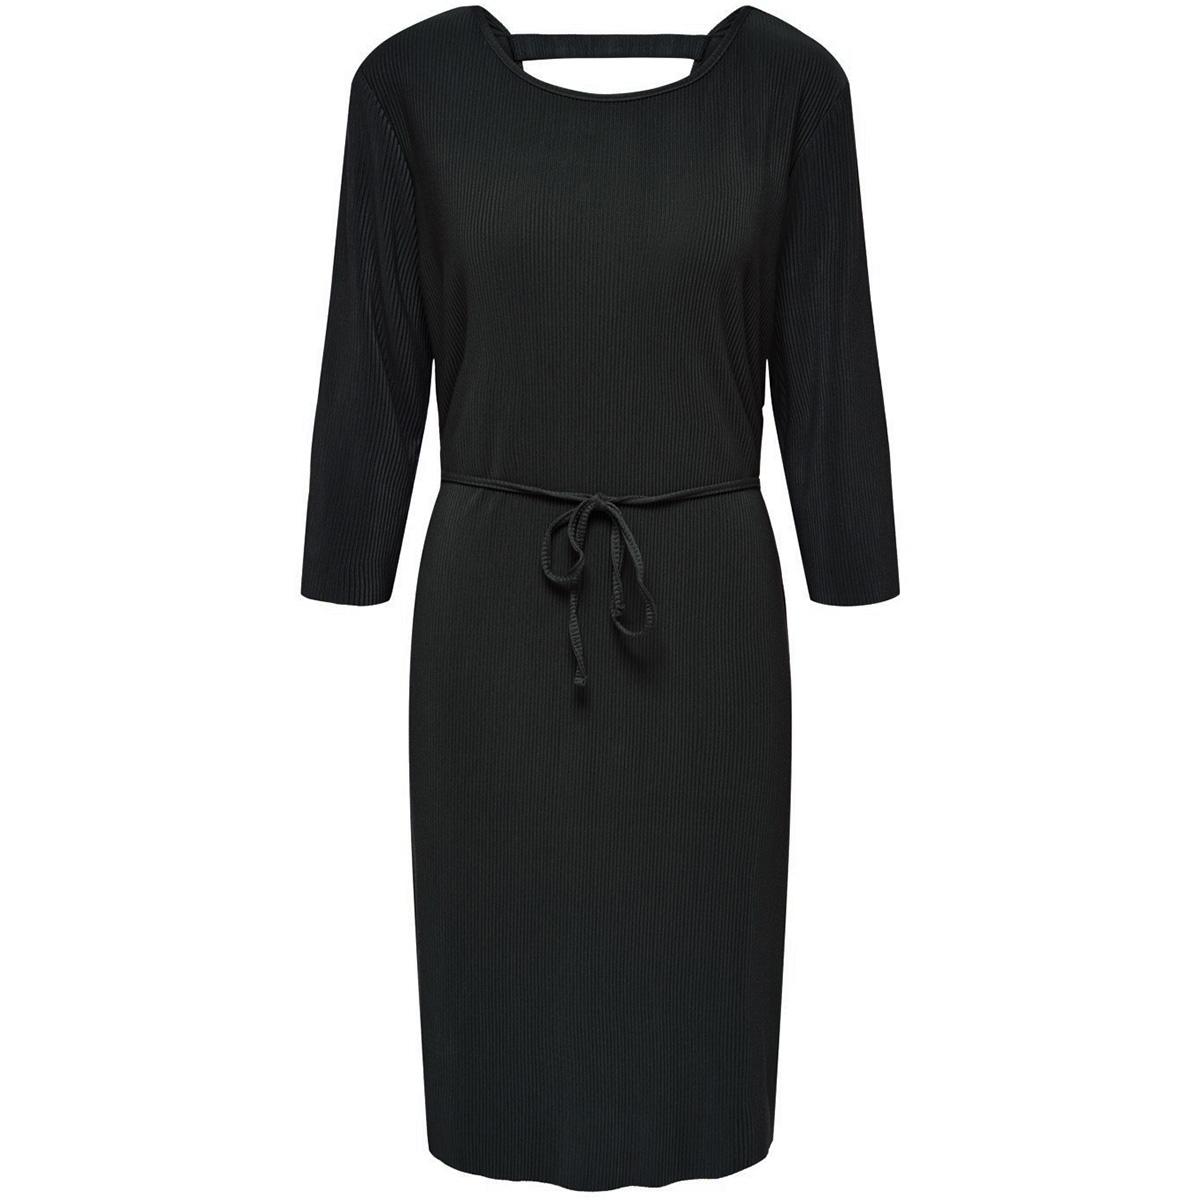 jdyesmarilla 2/4 back detail dress 15184075 jacqueline de yong jurk black